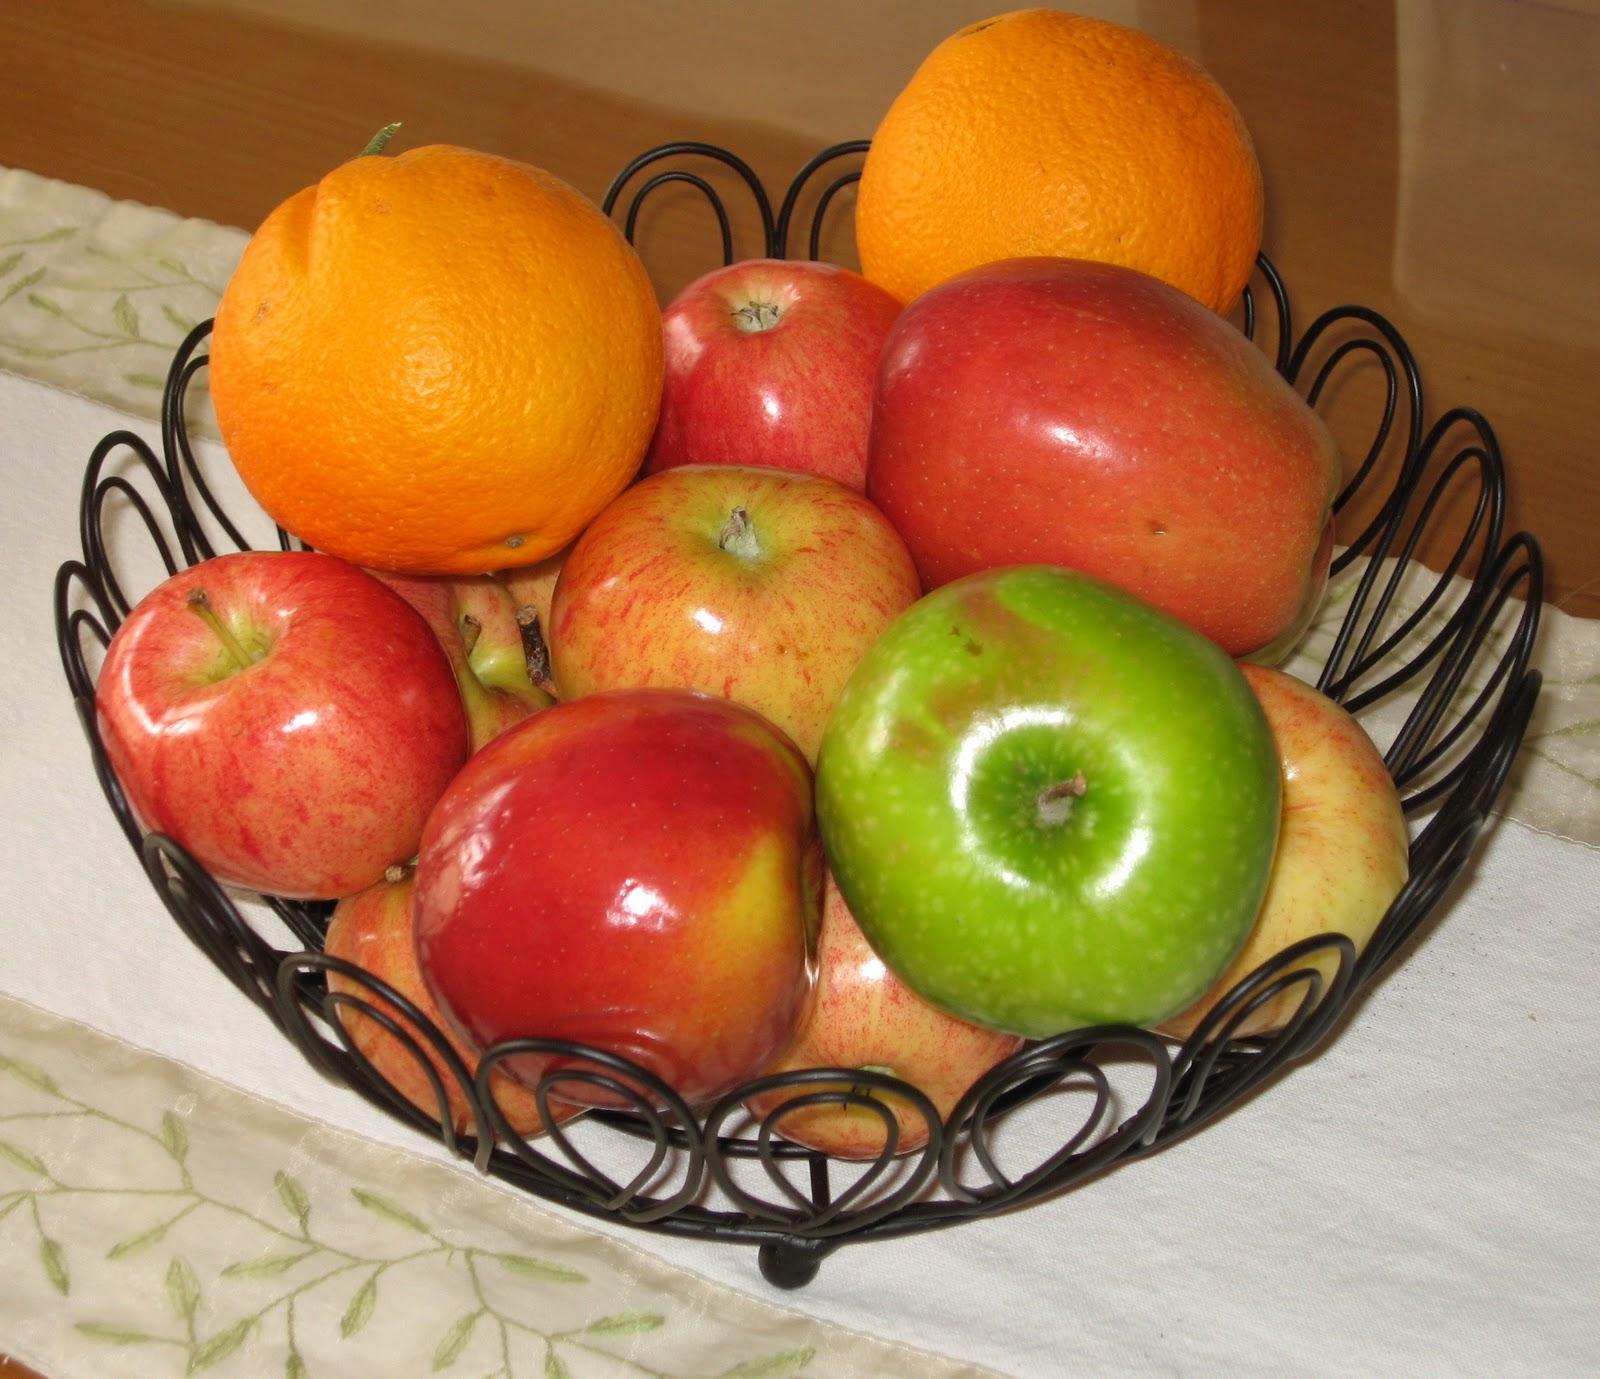 http://2.bp.blogspot.com/-0htf51BnfLY/TZvlsnj8TOI/AAAAAAAADKo/LWP8jcClbB8/s1600/fruit+bowl.jpg